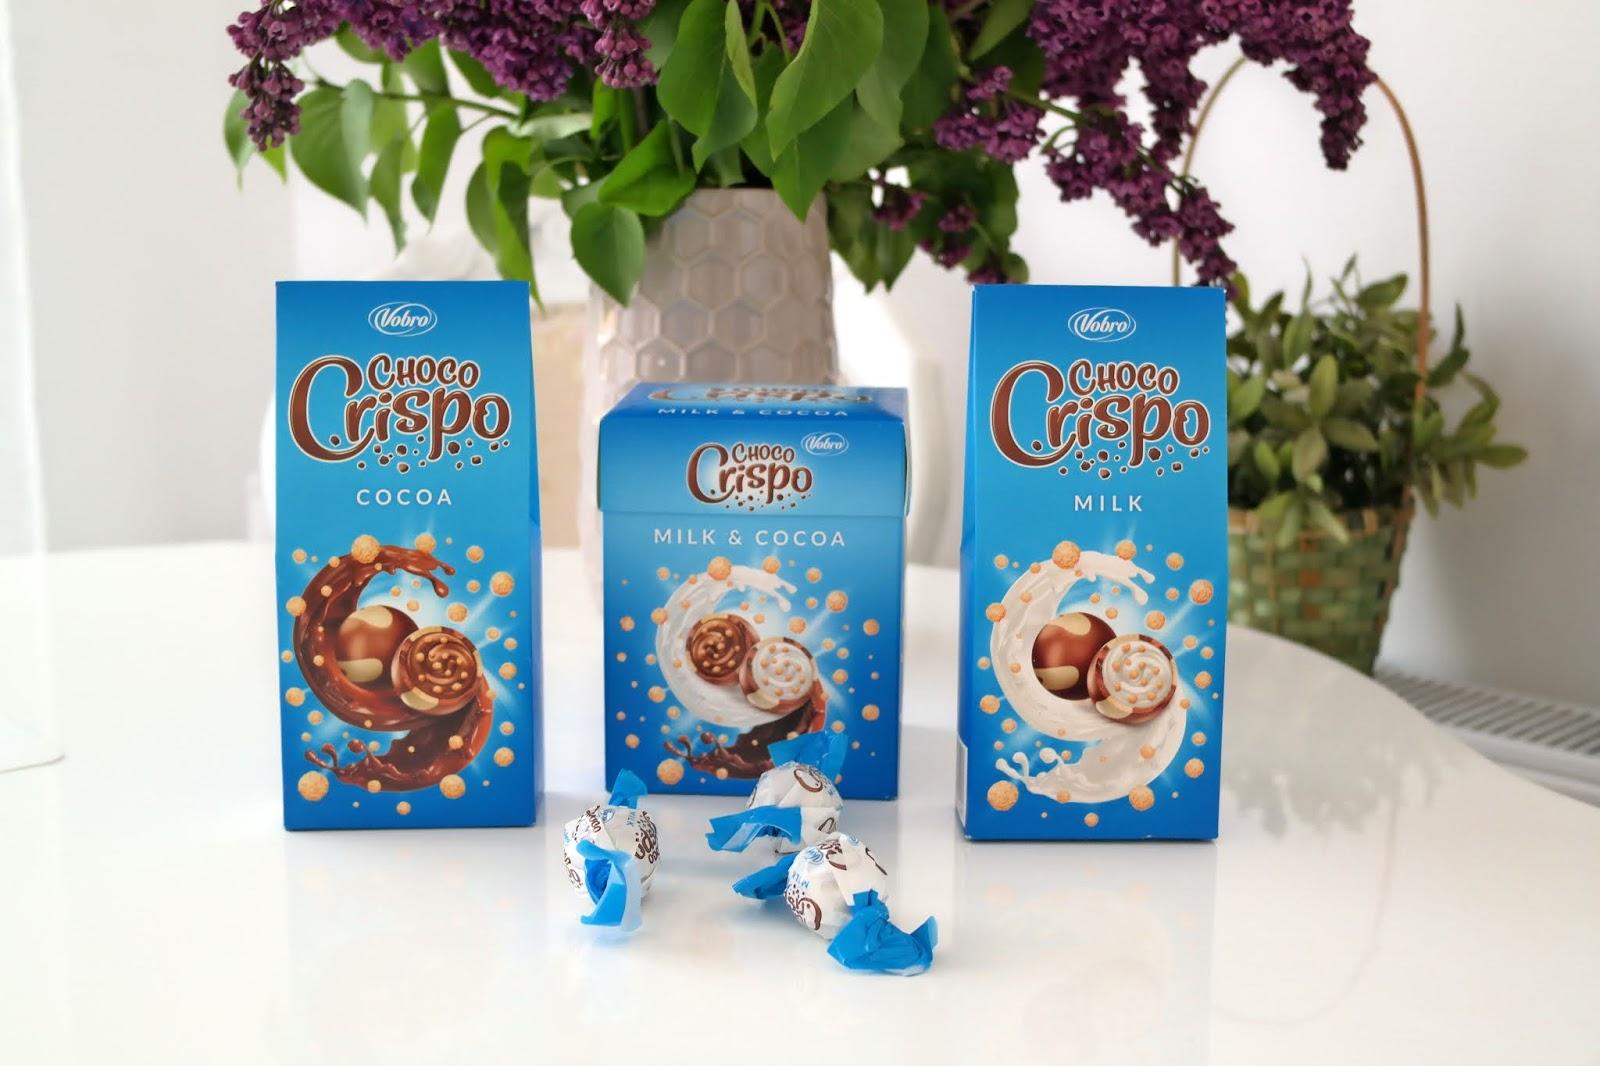 czekoladki vobro